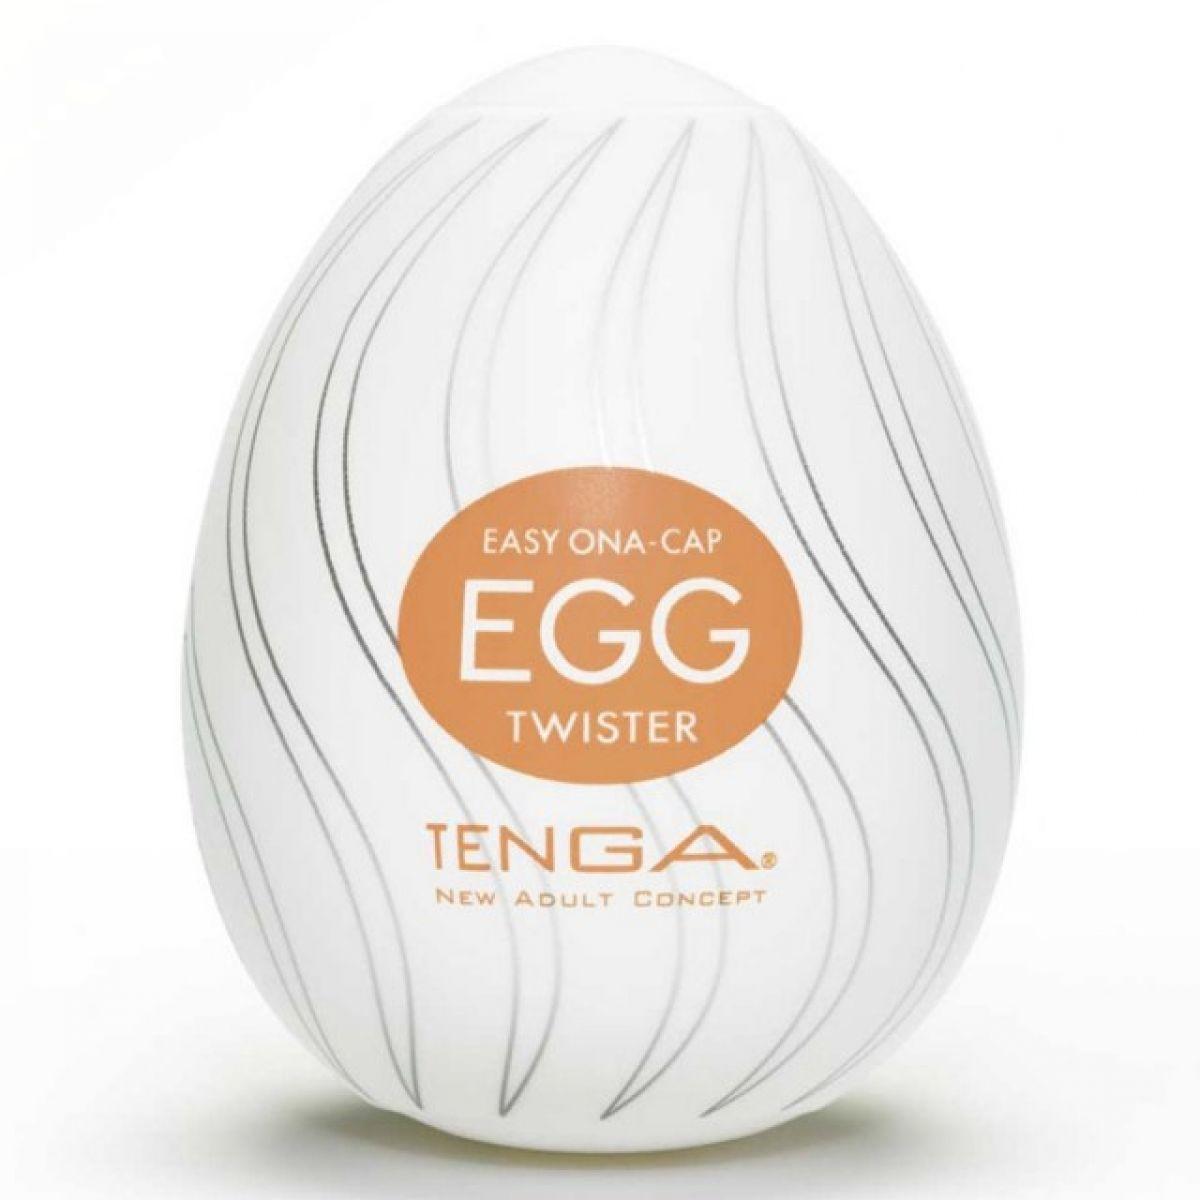 Мастурбатор яйцо Tenga egg Twister (Оригинал)